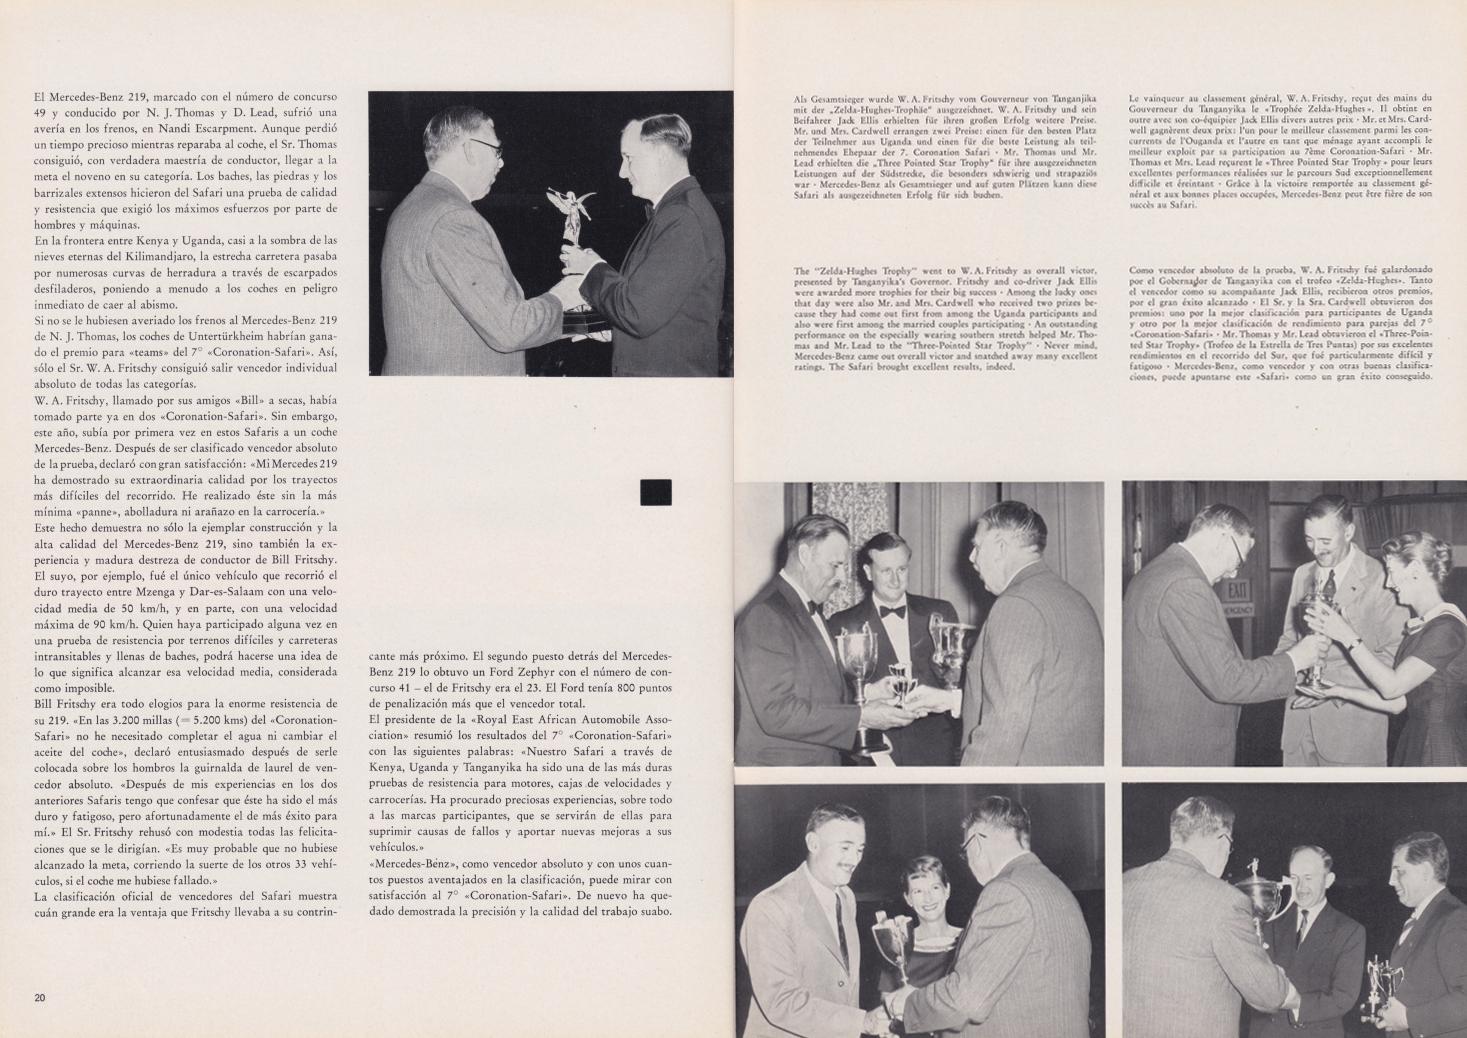 (REVISTA): Periódico In aller welt n.º 33 - Mercedes-Benz no mundo - 1959 - multilingue 011